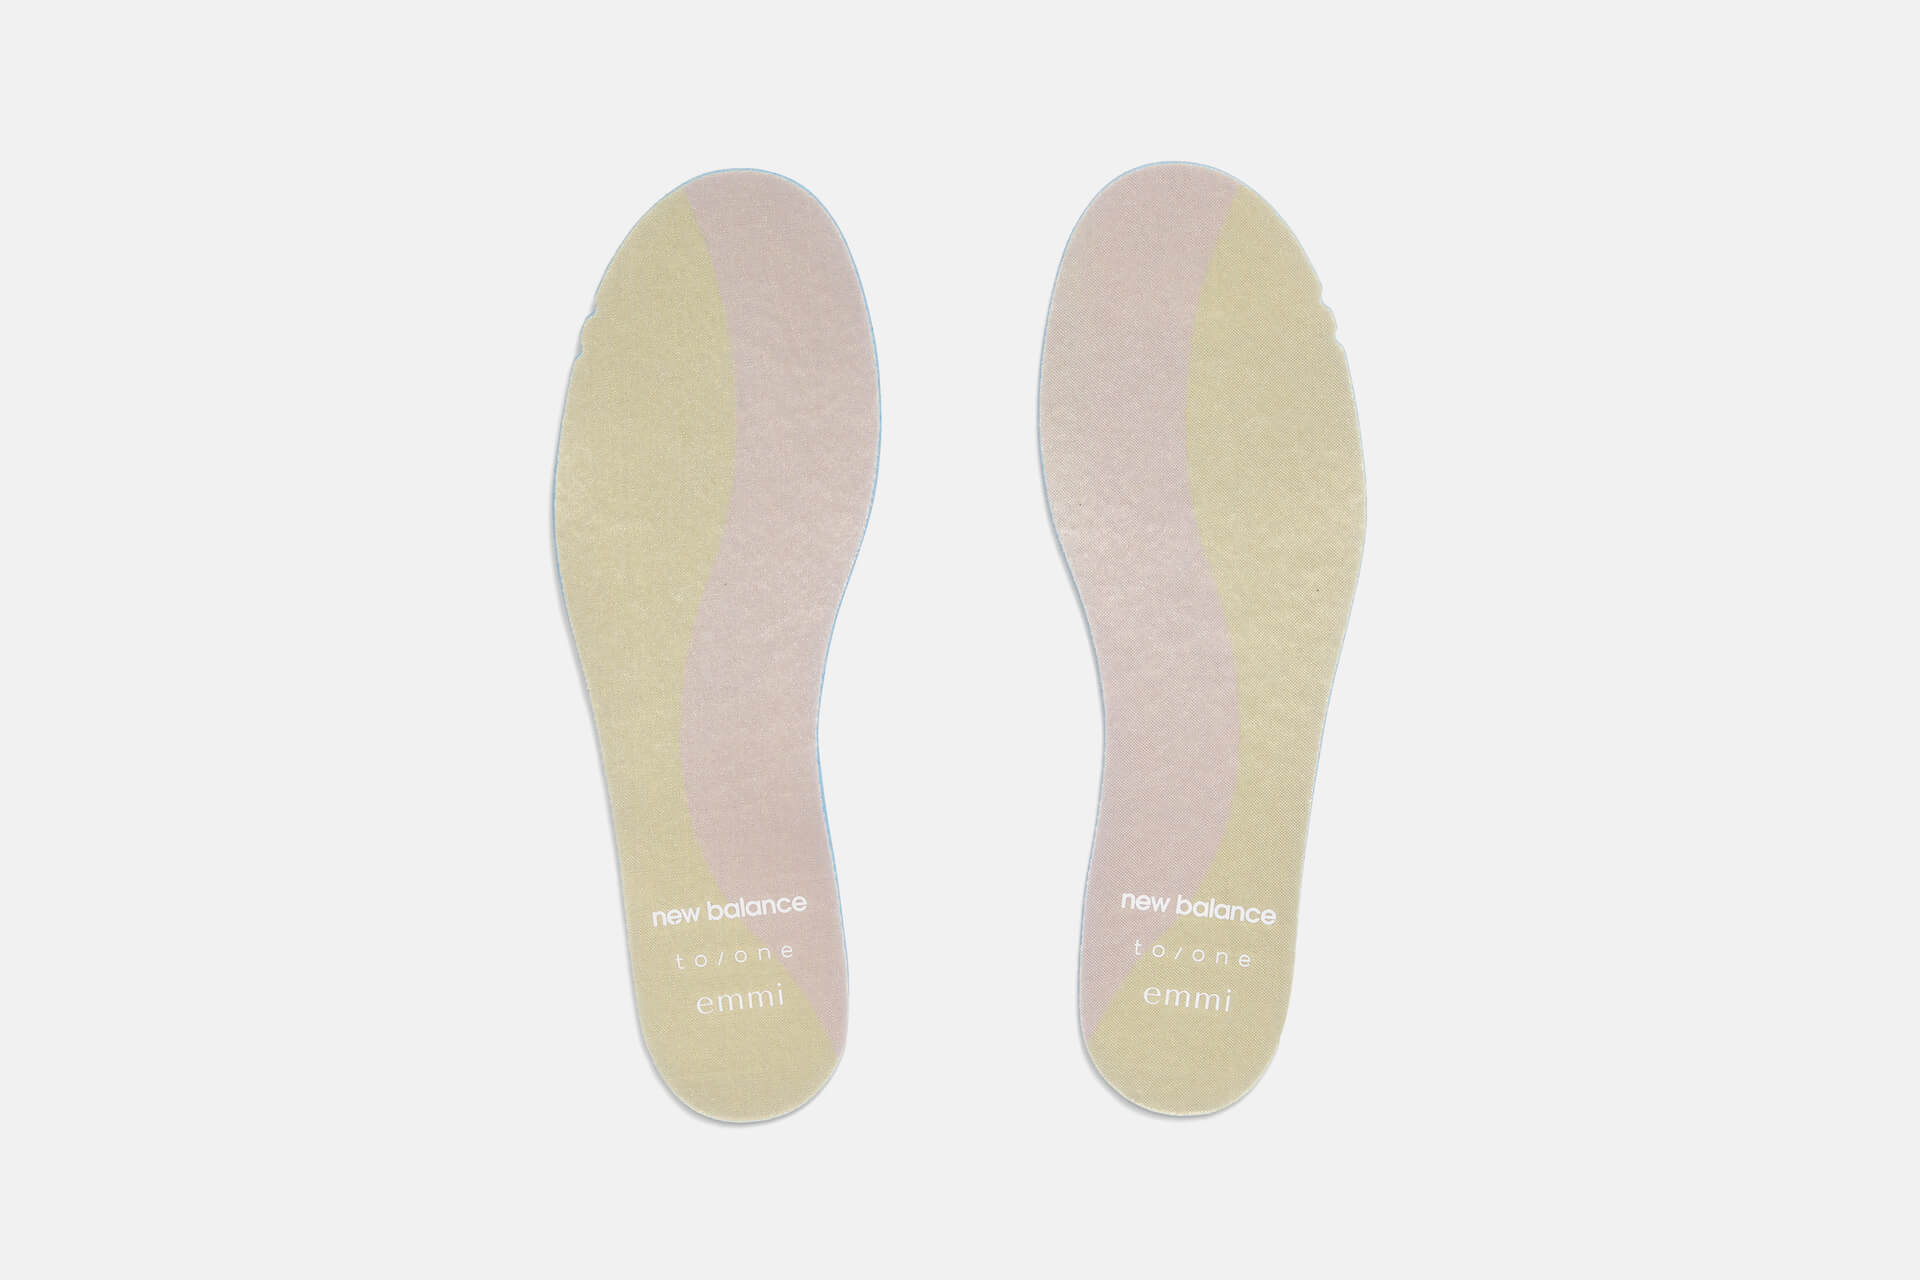 New Balanceの人気モデル「327」からemmi、to/oneとのトリプルコラボレーションモデルが登場!限定店舗で販売 fashion211008_newbalance-01